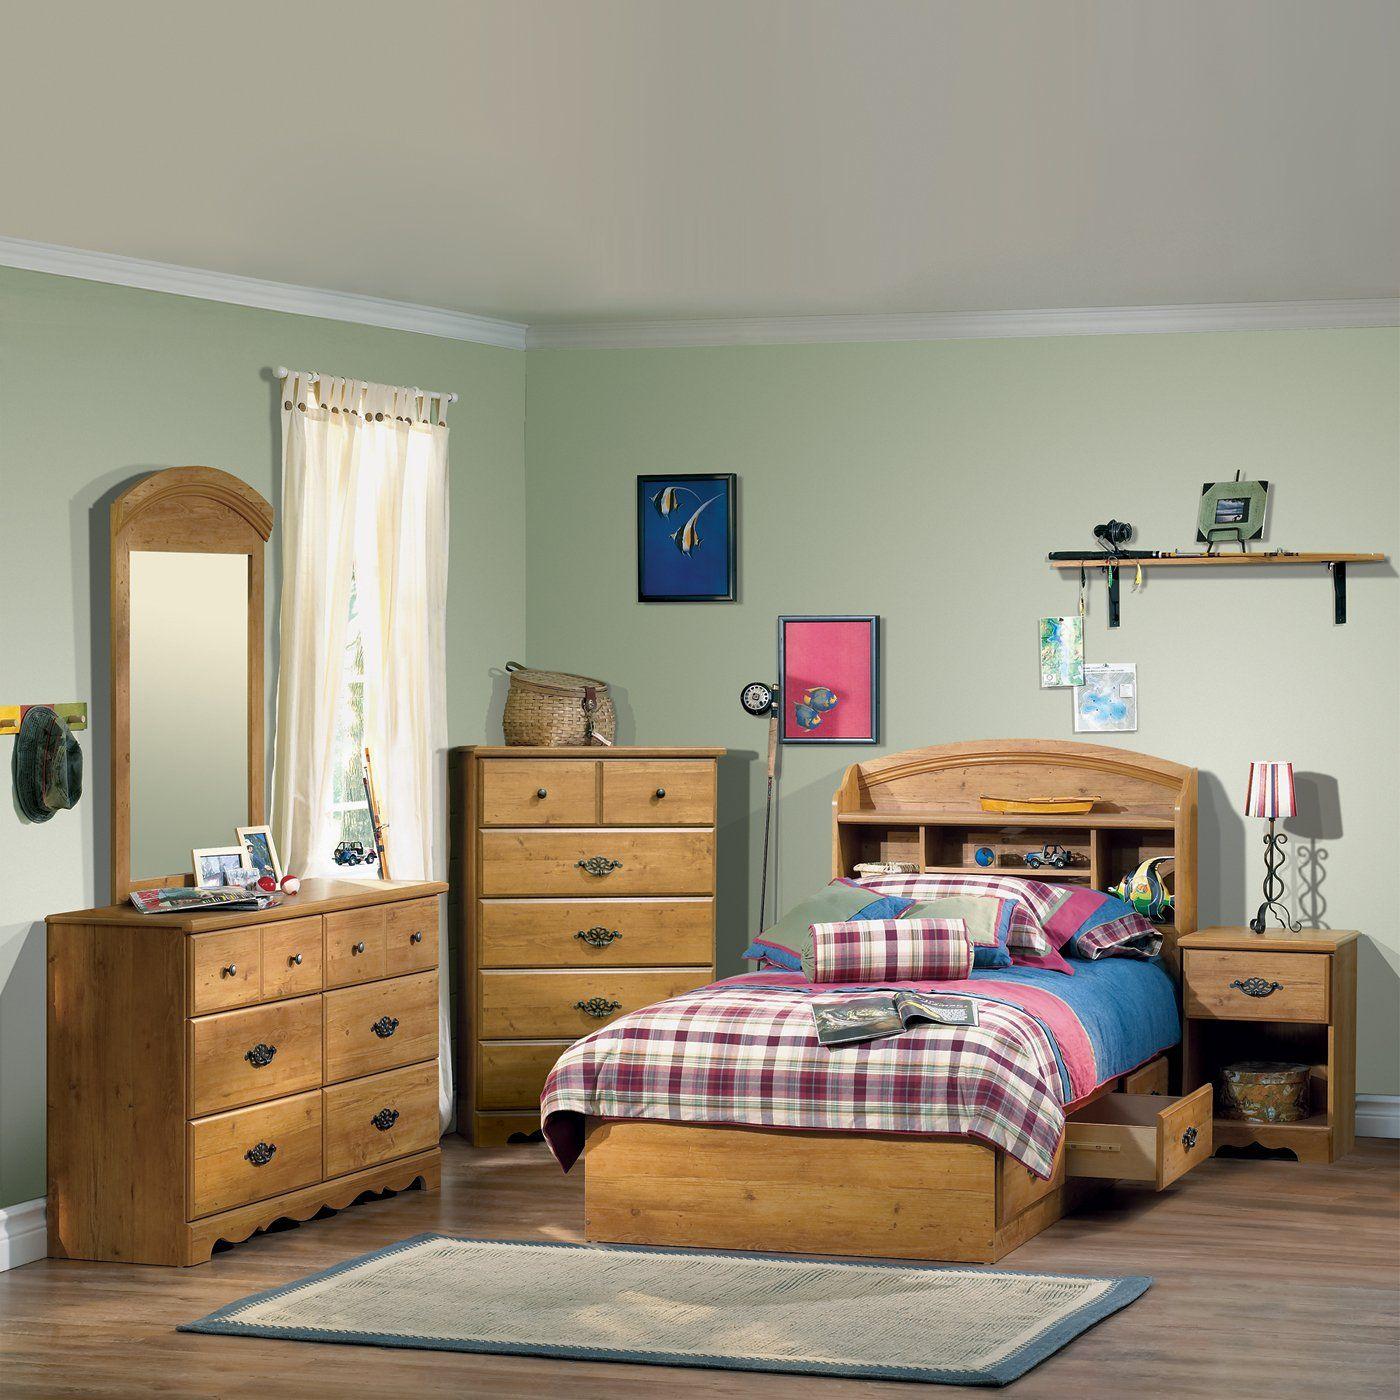 South Shore Furniture 3232 Prairie Mates Kids Bedroom Set Youth Bedroom Furniture Boys Bedroom Furniture Modern Bedroom Furniture South shore bedroom furniture